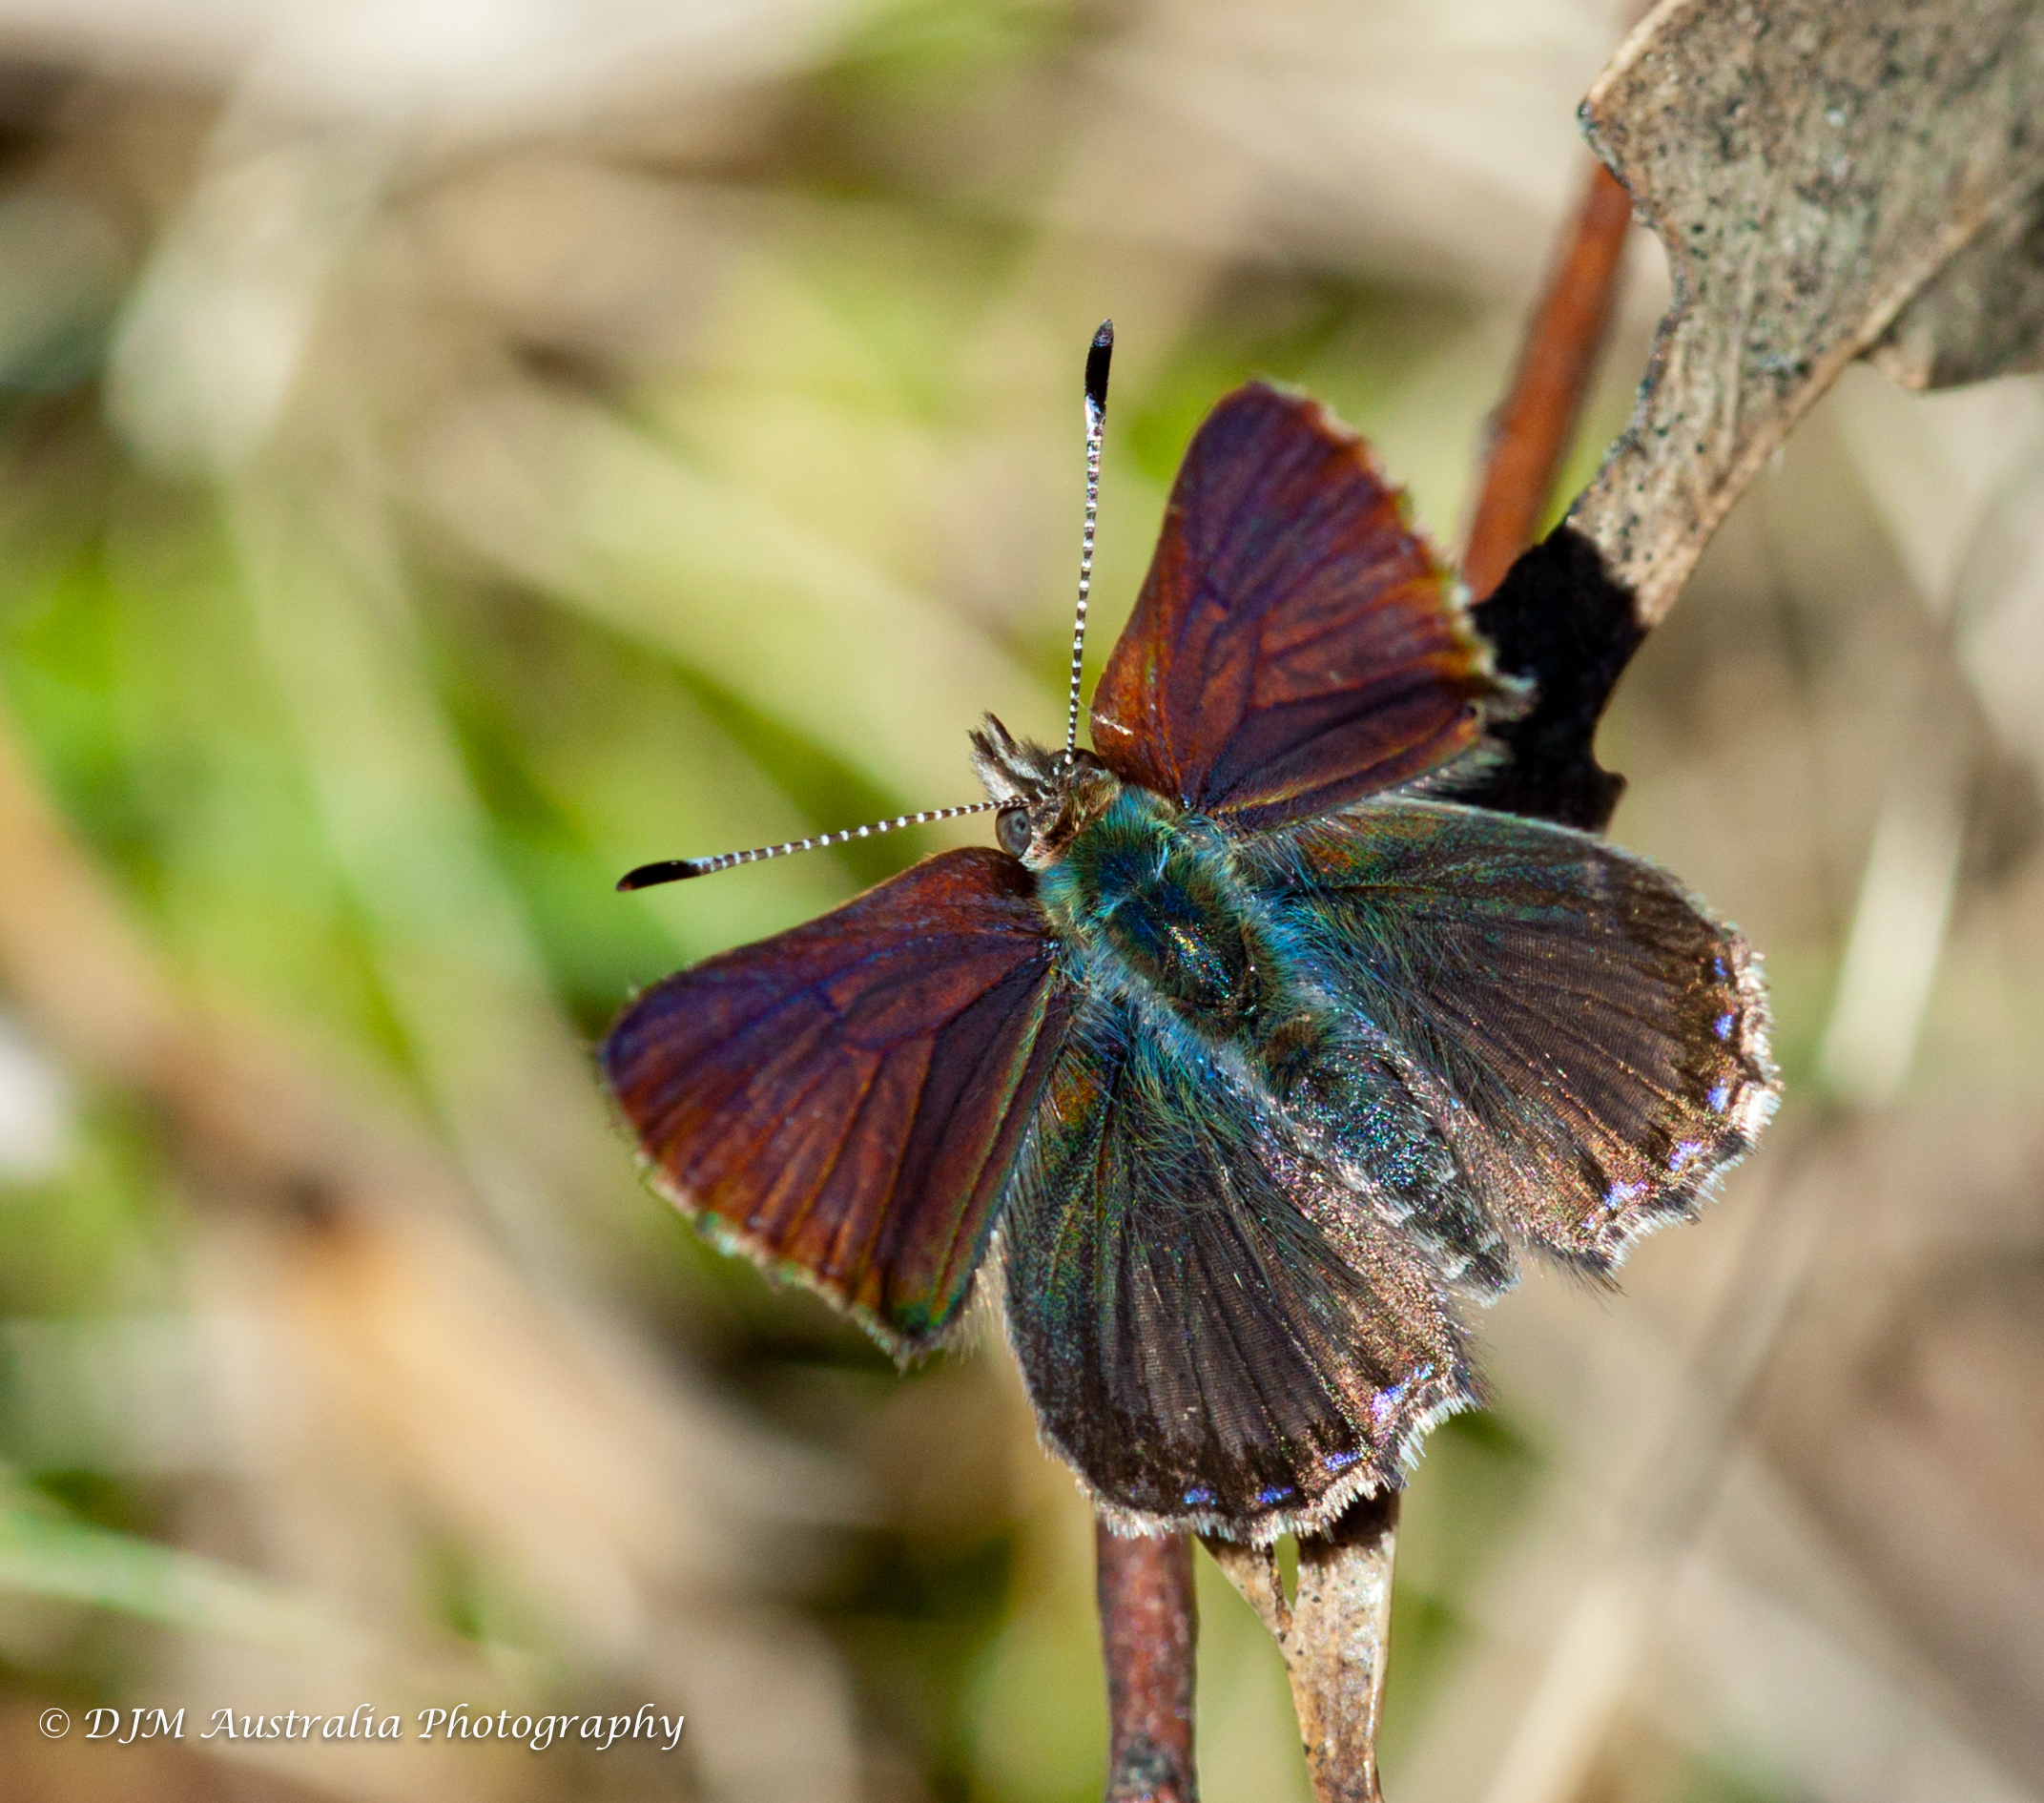 Bathurst Copper Butterfly (image courtesy of DJM Australia Photography